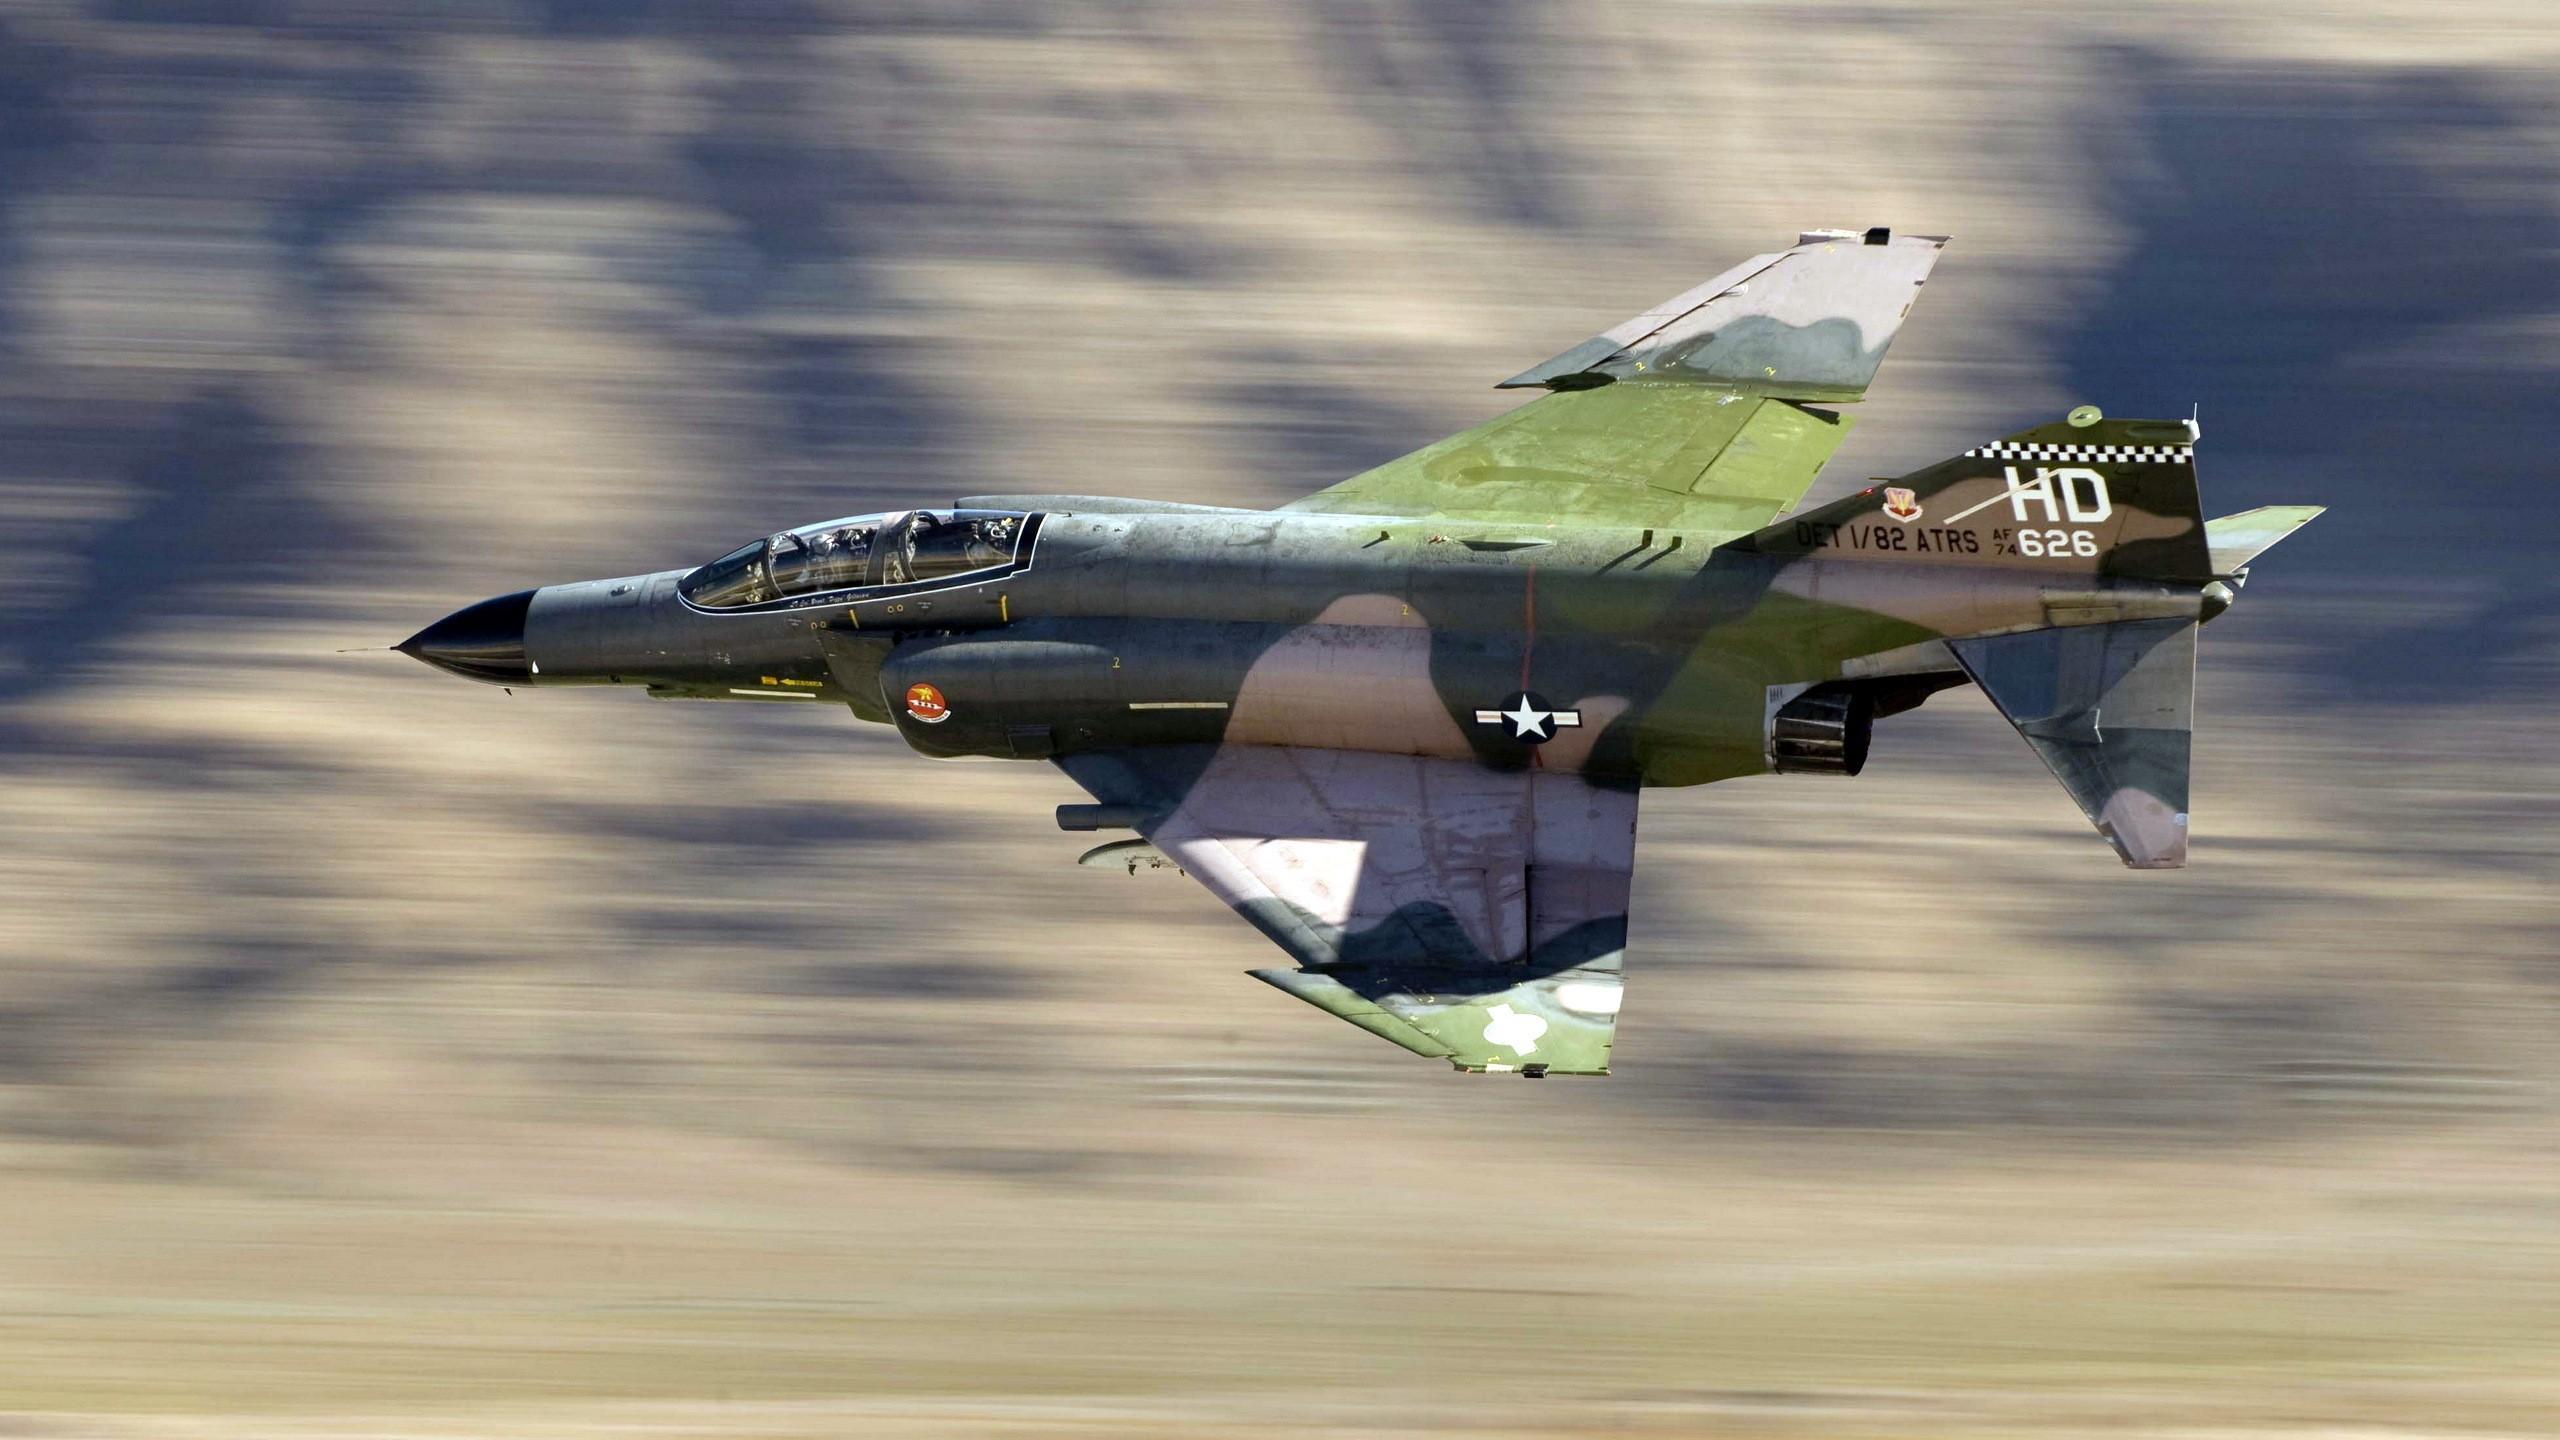 F4 Phantom - 2560x1440